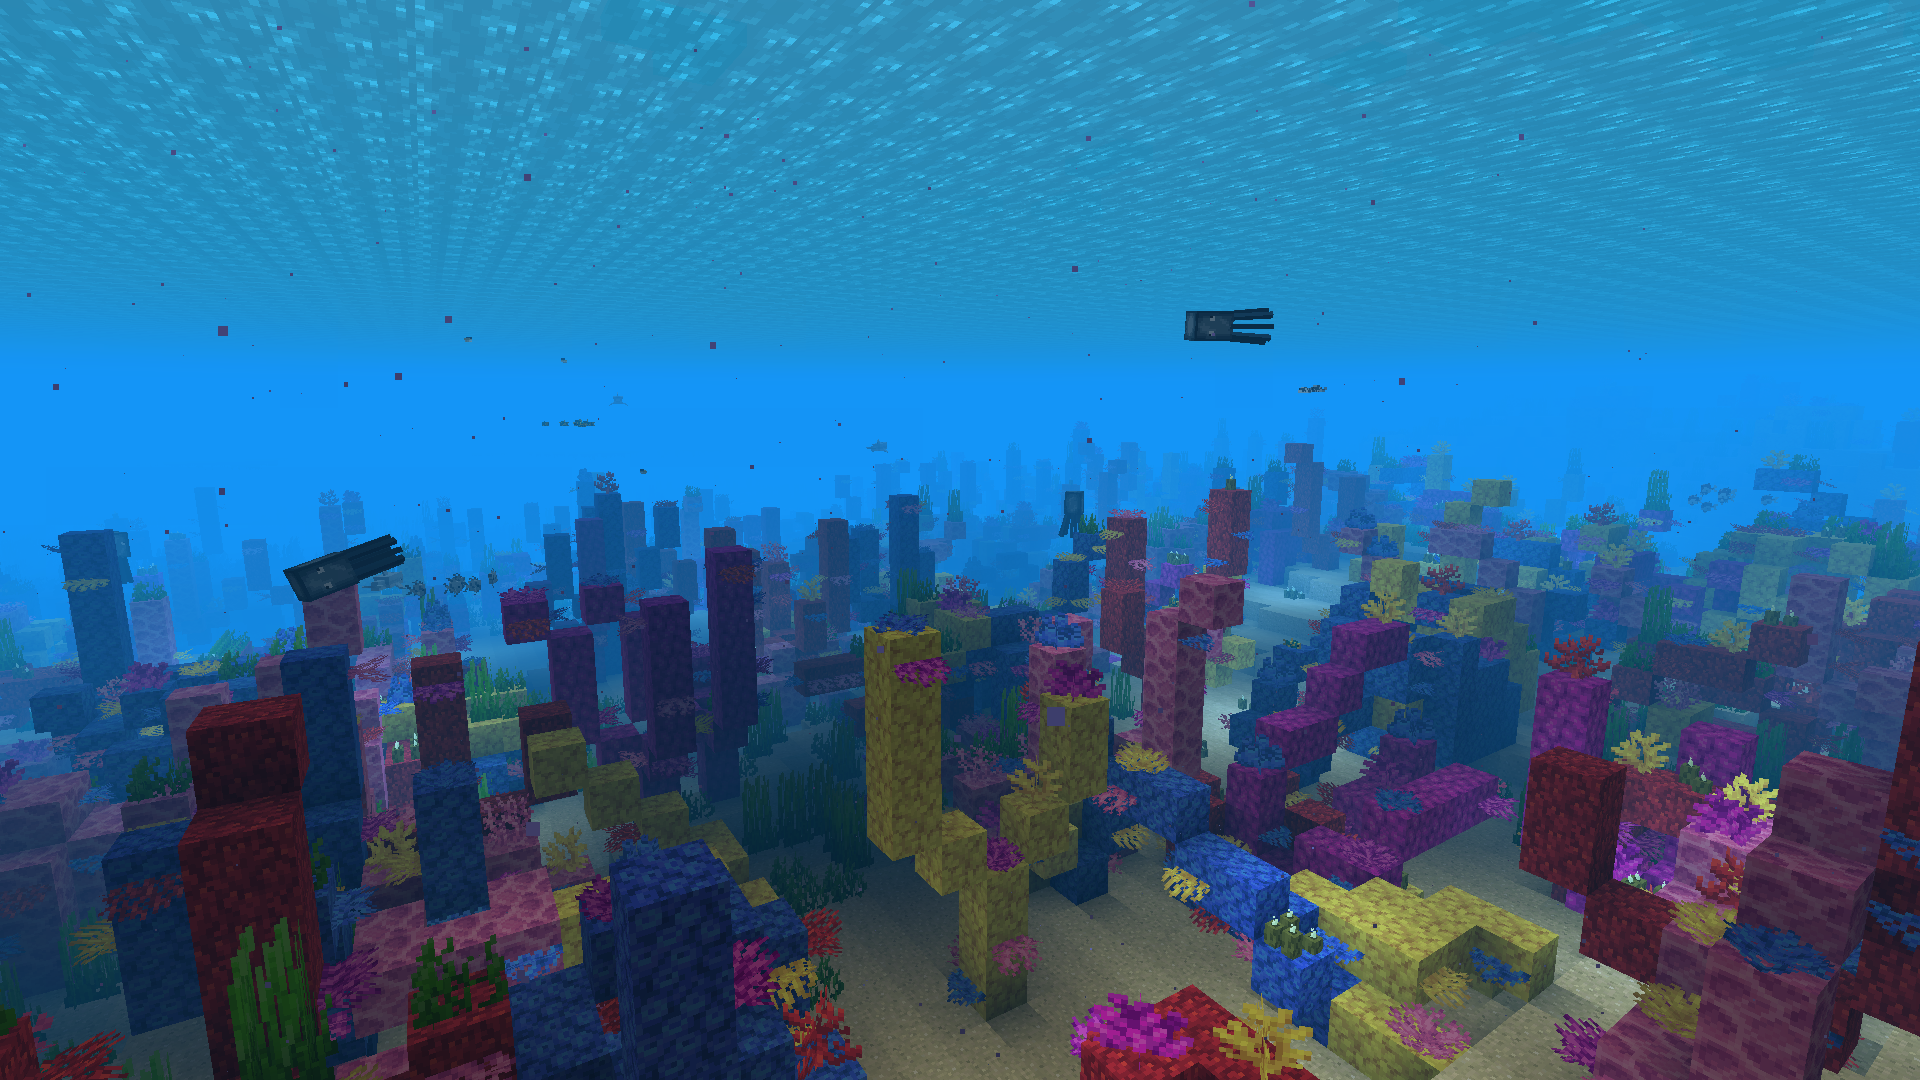 Картинка майнкрафт под водой